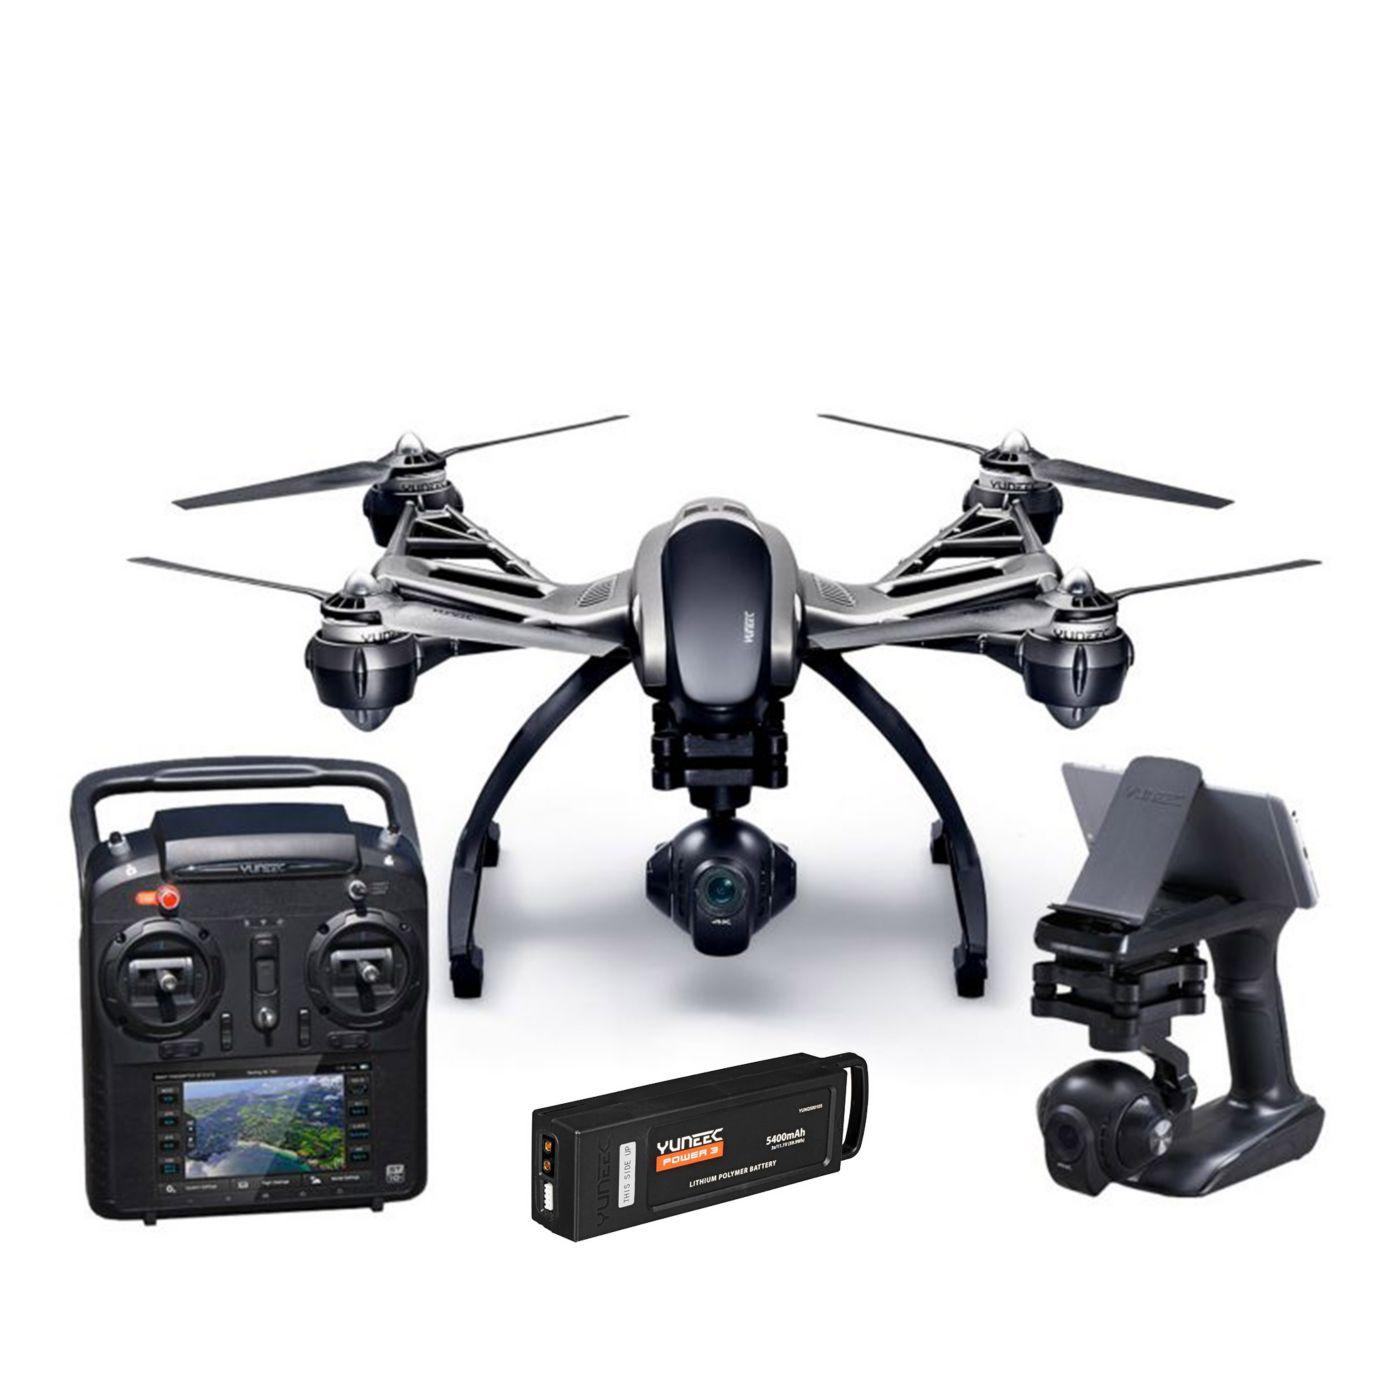 Yuneec Typhoon Q500 4K - Video Quadcopter - $399 w/ Google Express